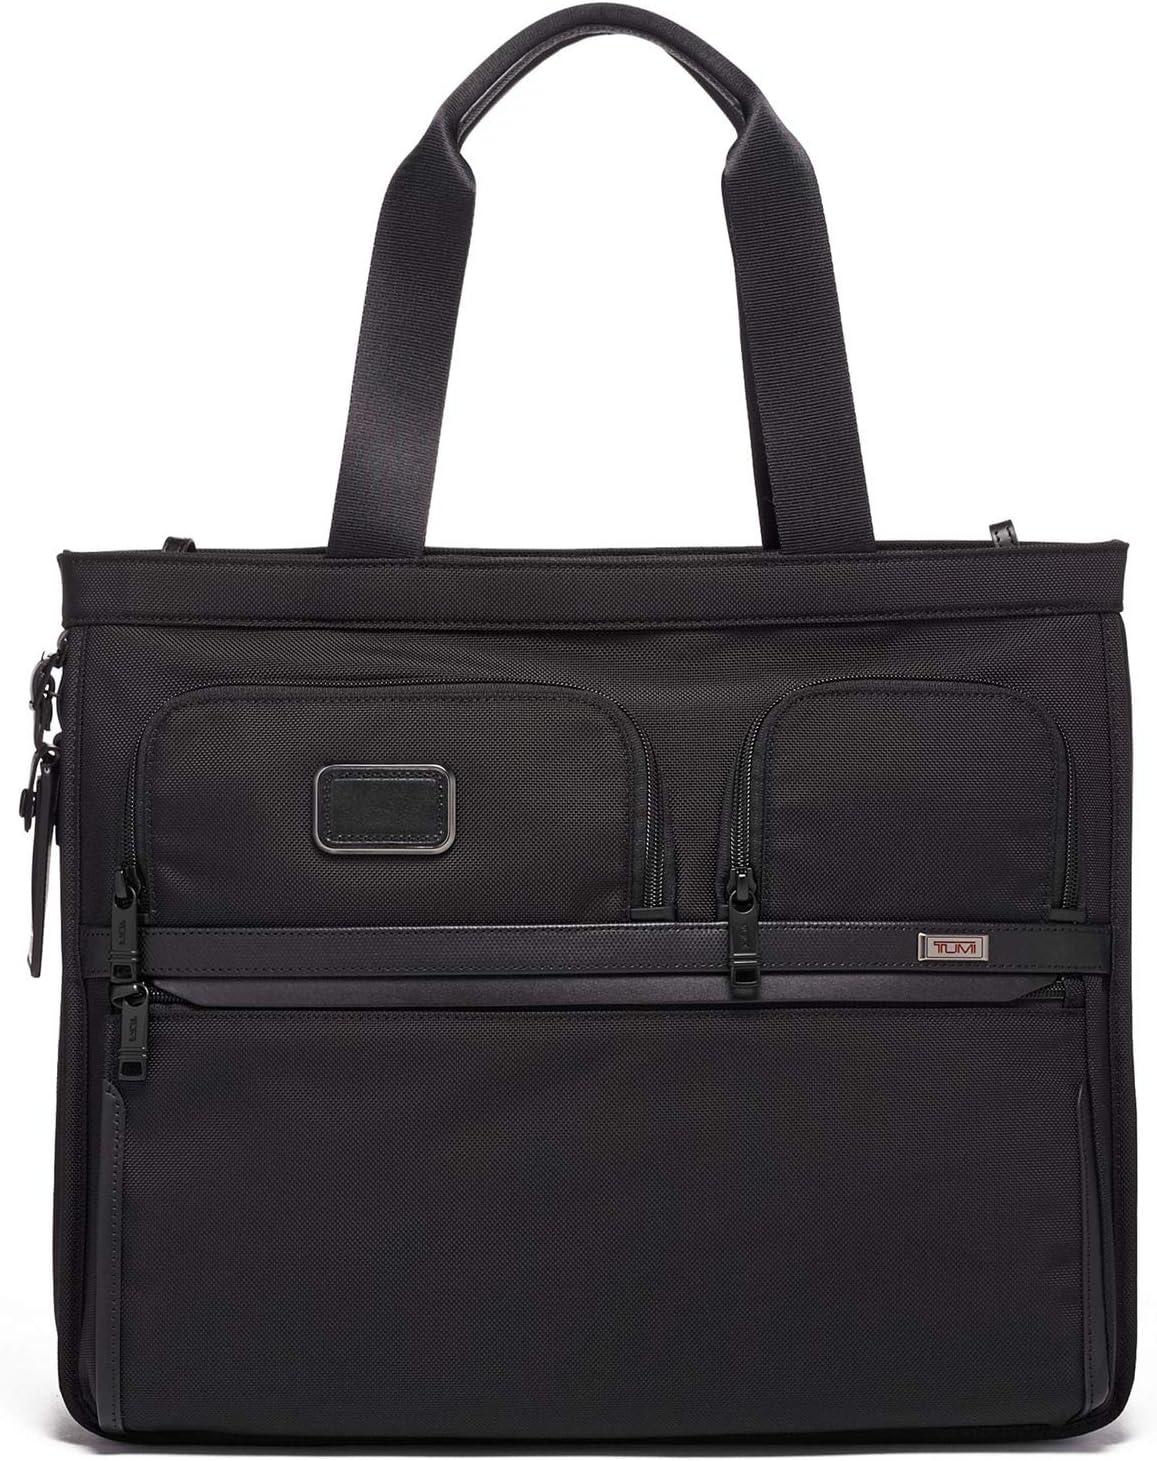 TUMI - Alpha 3 Expandable Tote - Organizer Travel Satchel Bag for Men and Women - Black